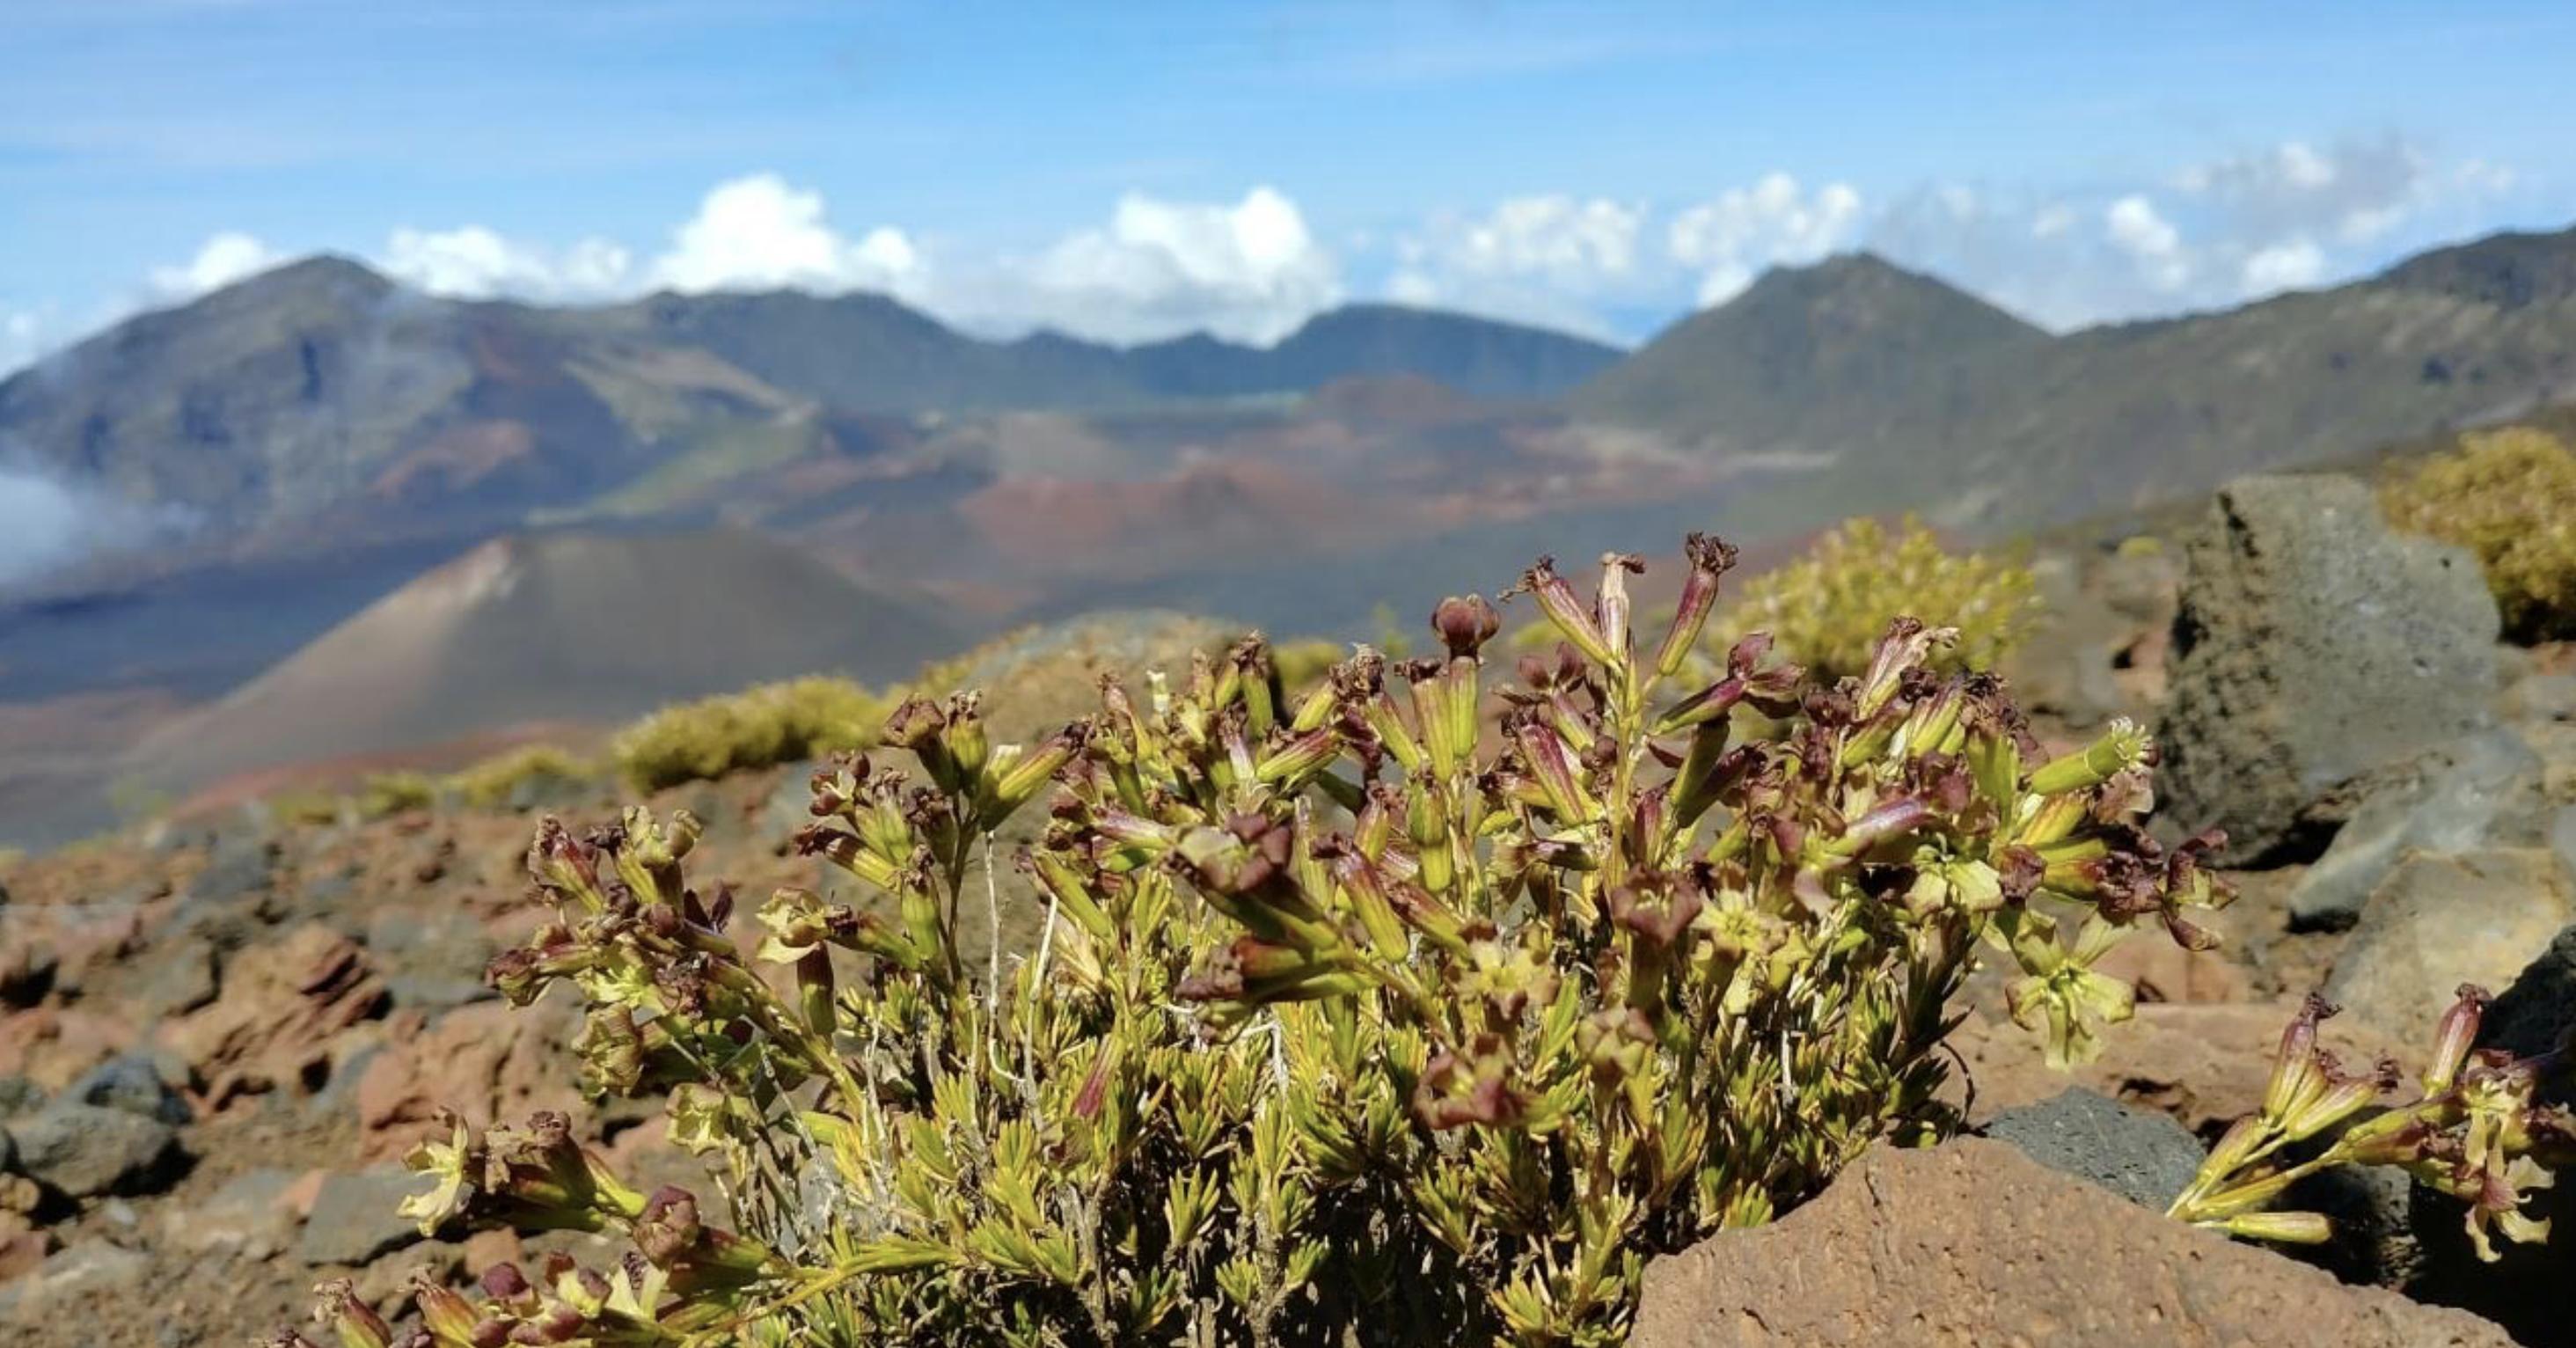 Distance Learning for Hawaiian Immersion Schools is on the Horizon at Haleakalā